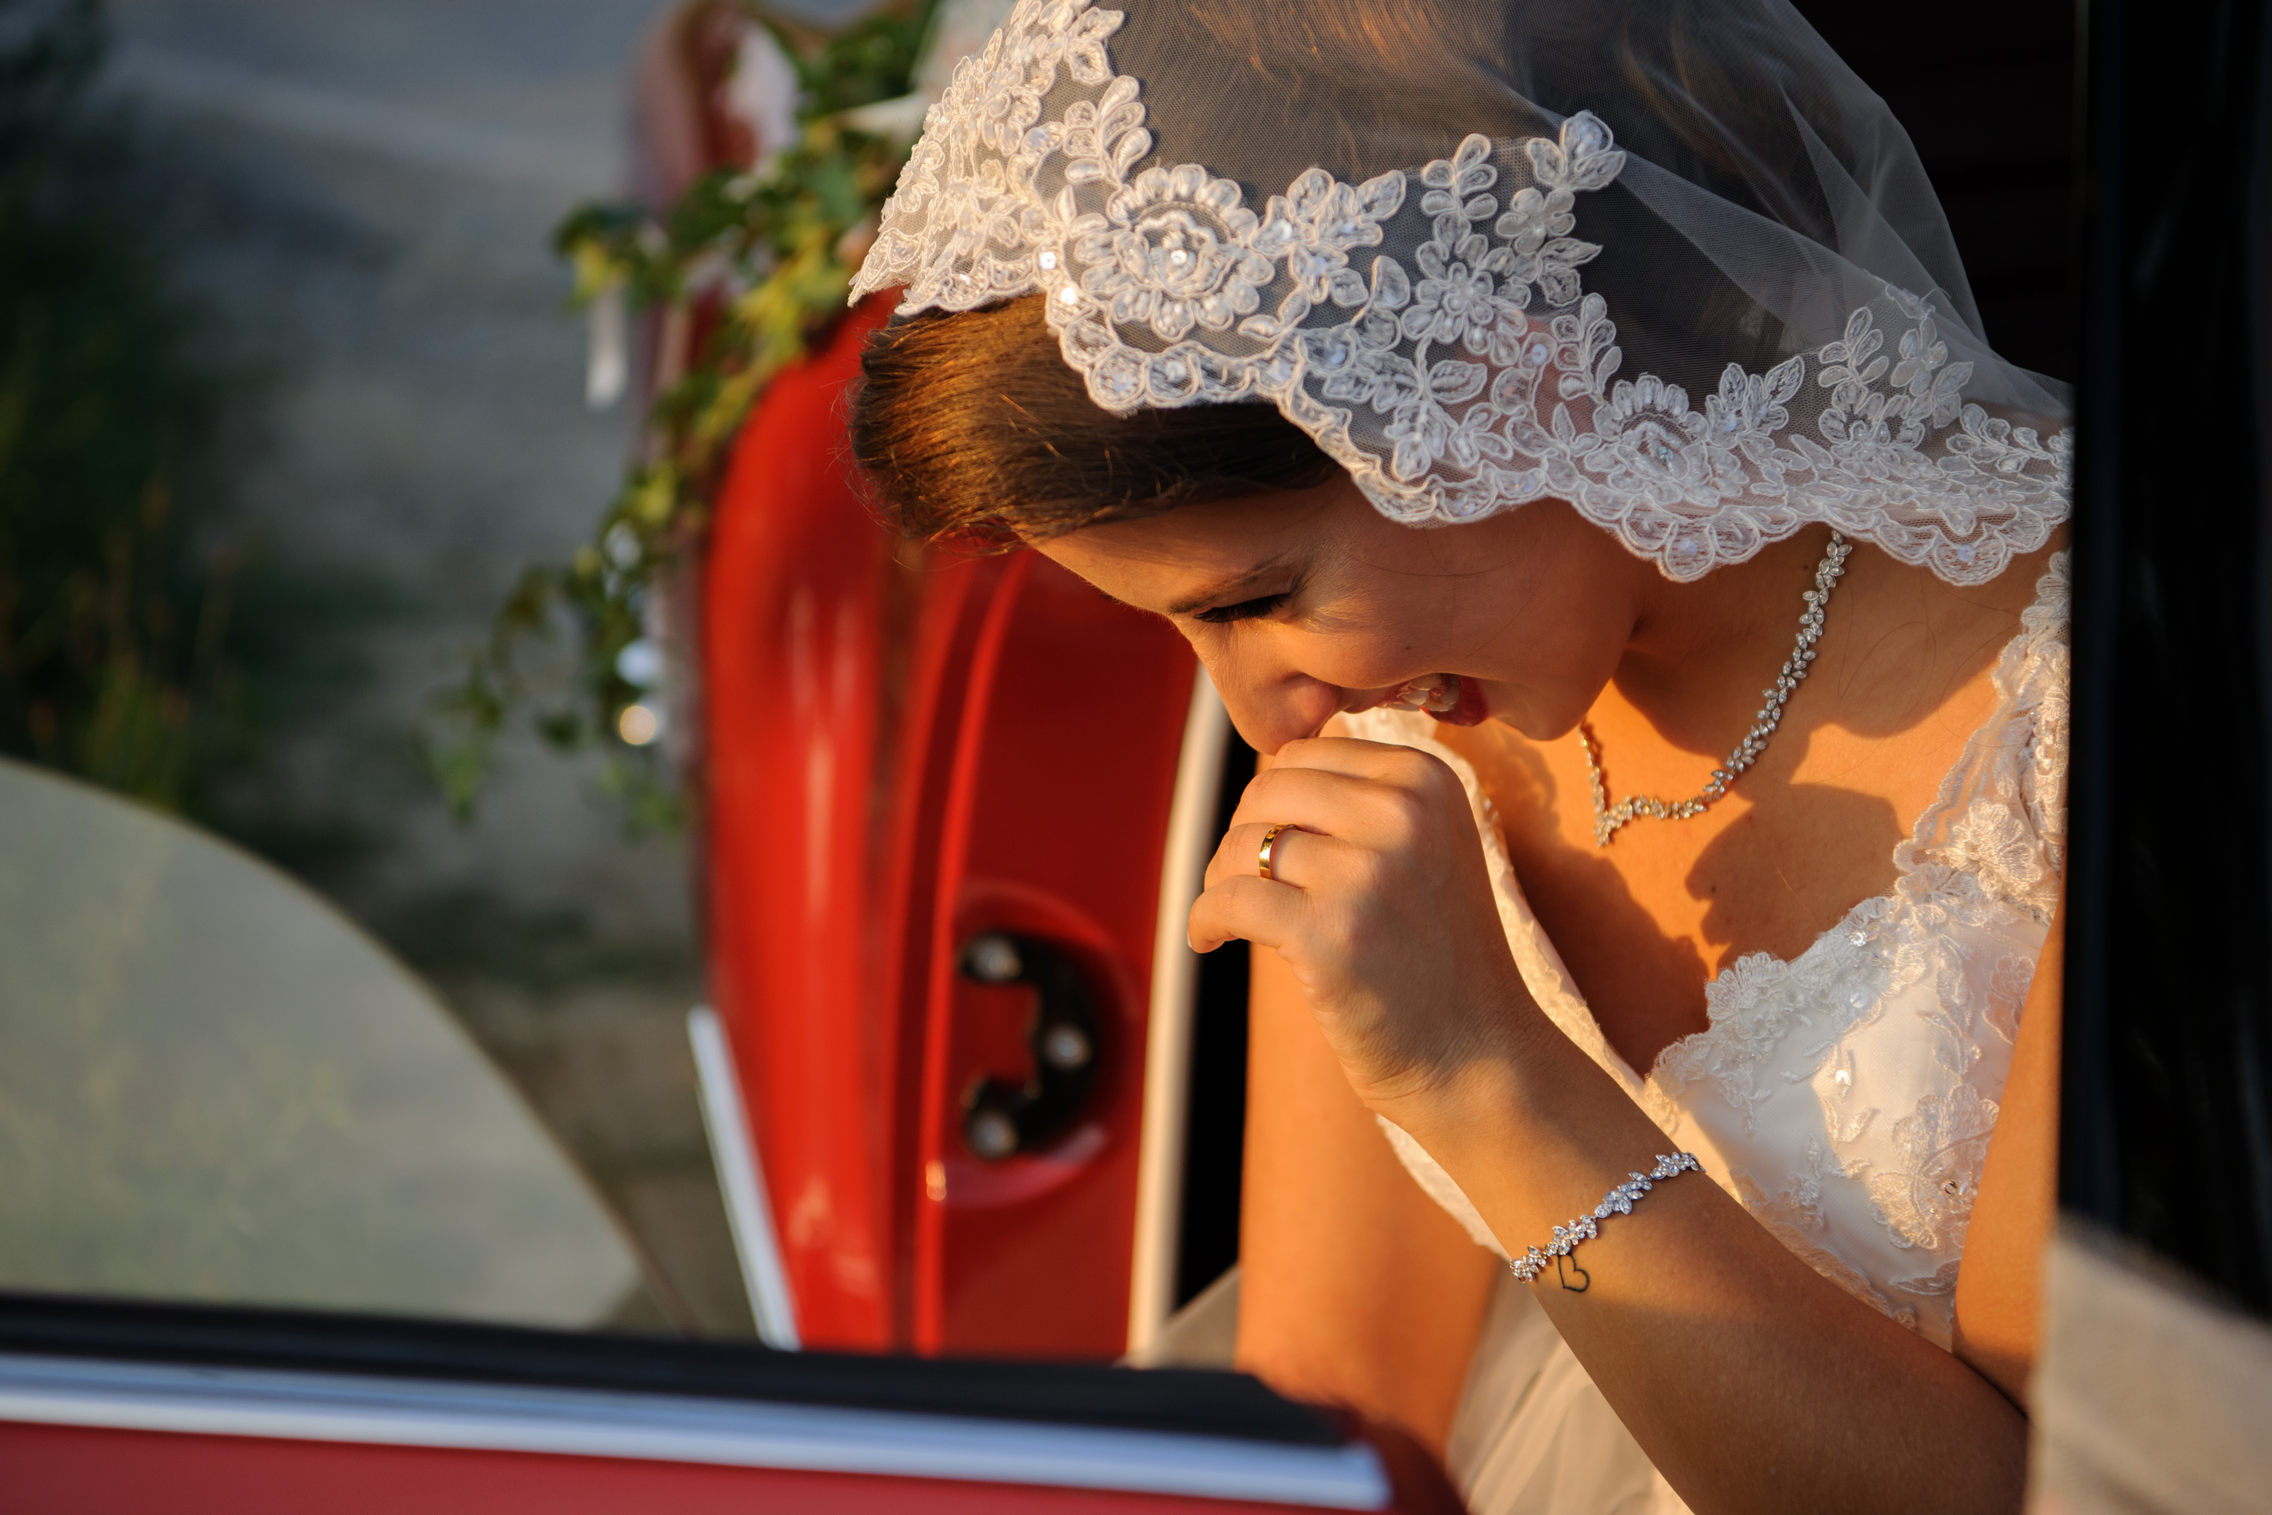 sposa che sorride - bride smiling